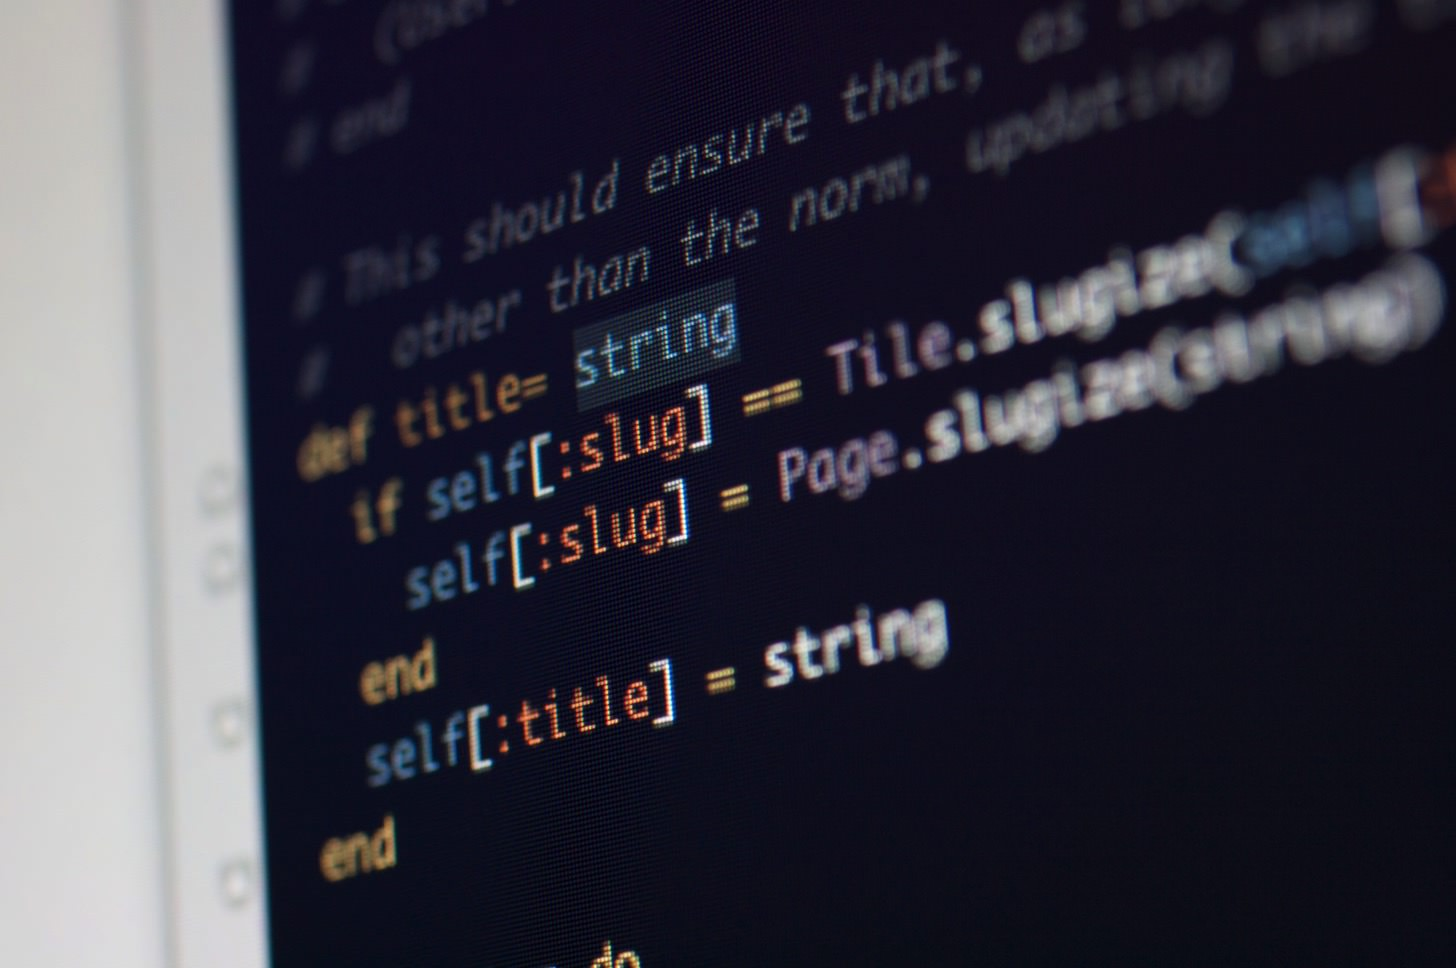 【Ruby】日本語をUTF-8でURLエンコード・デコードする方法。